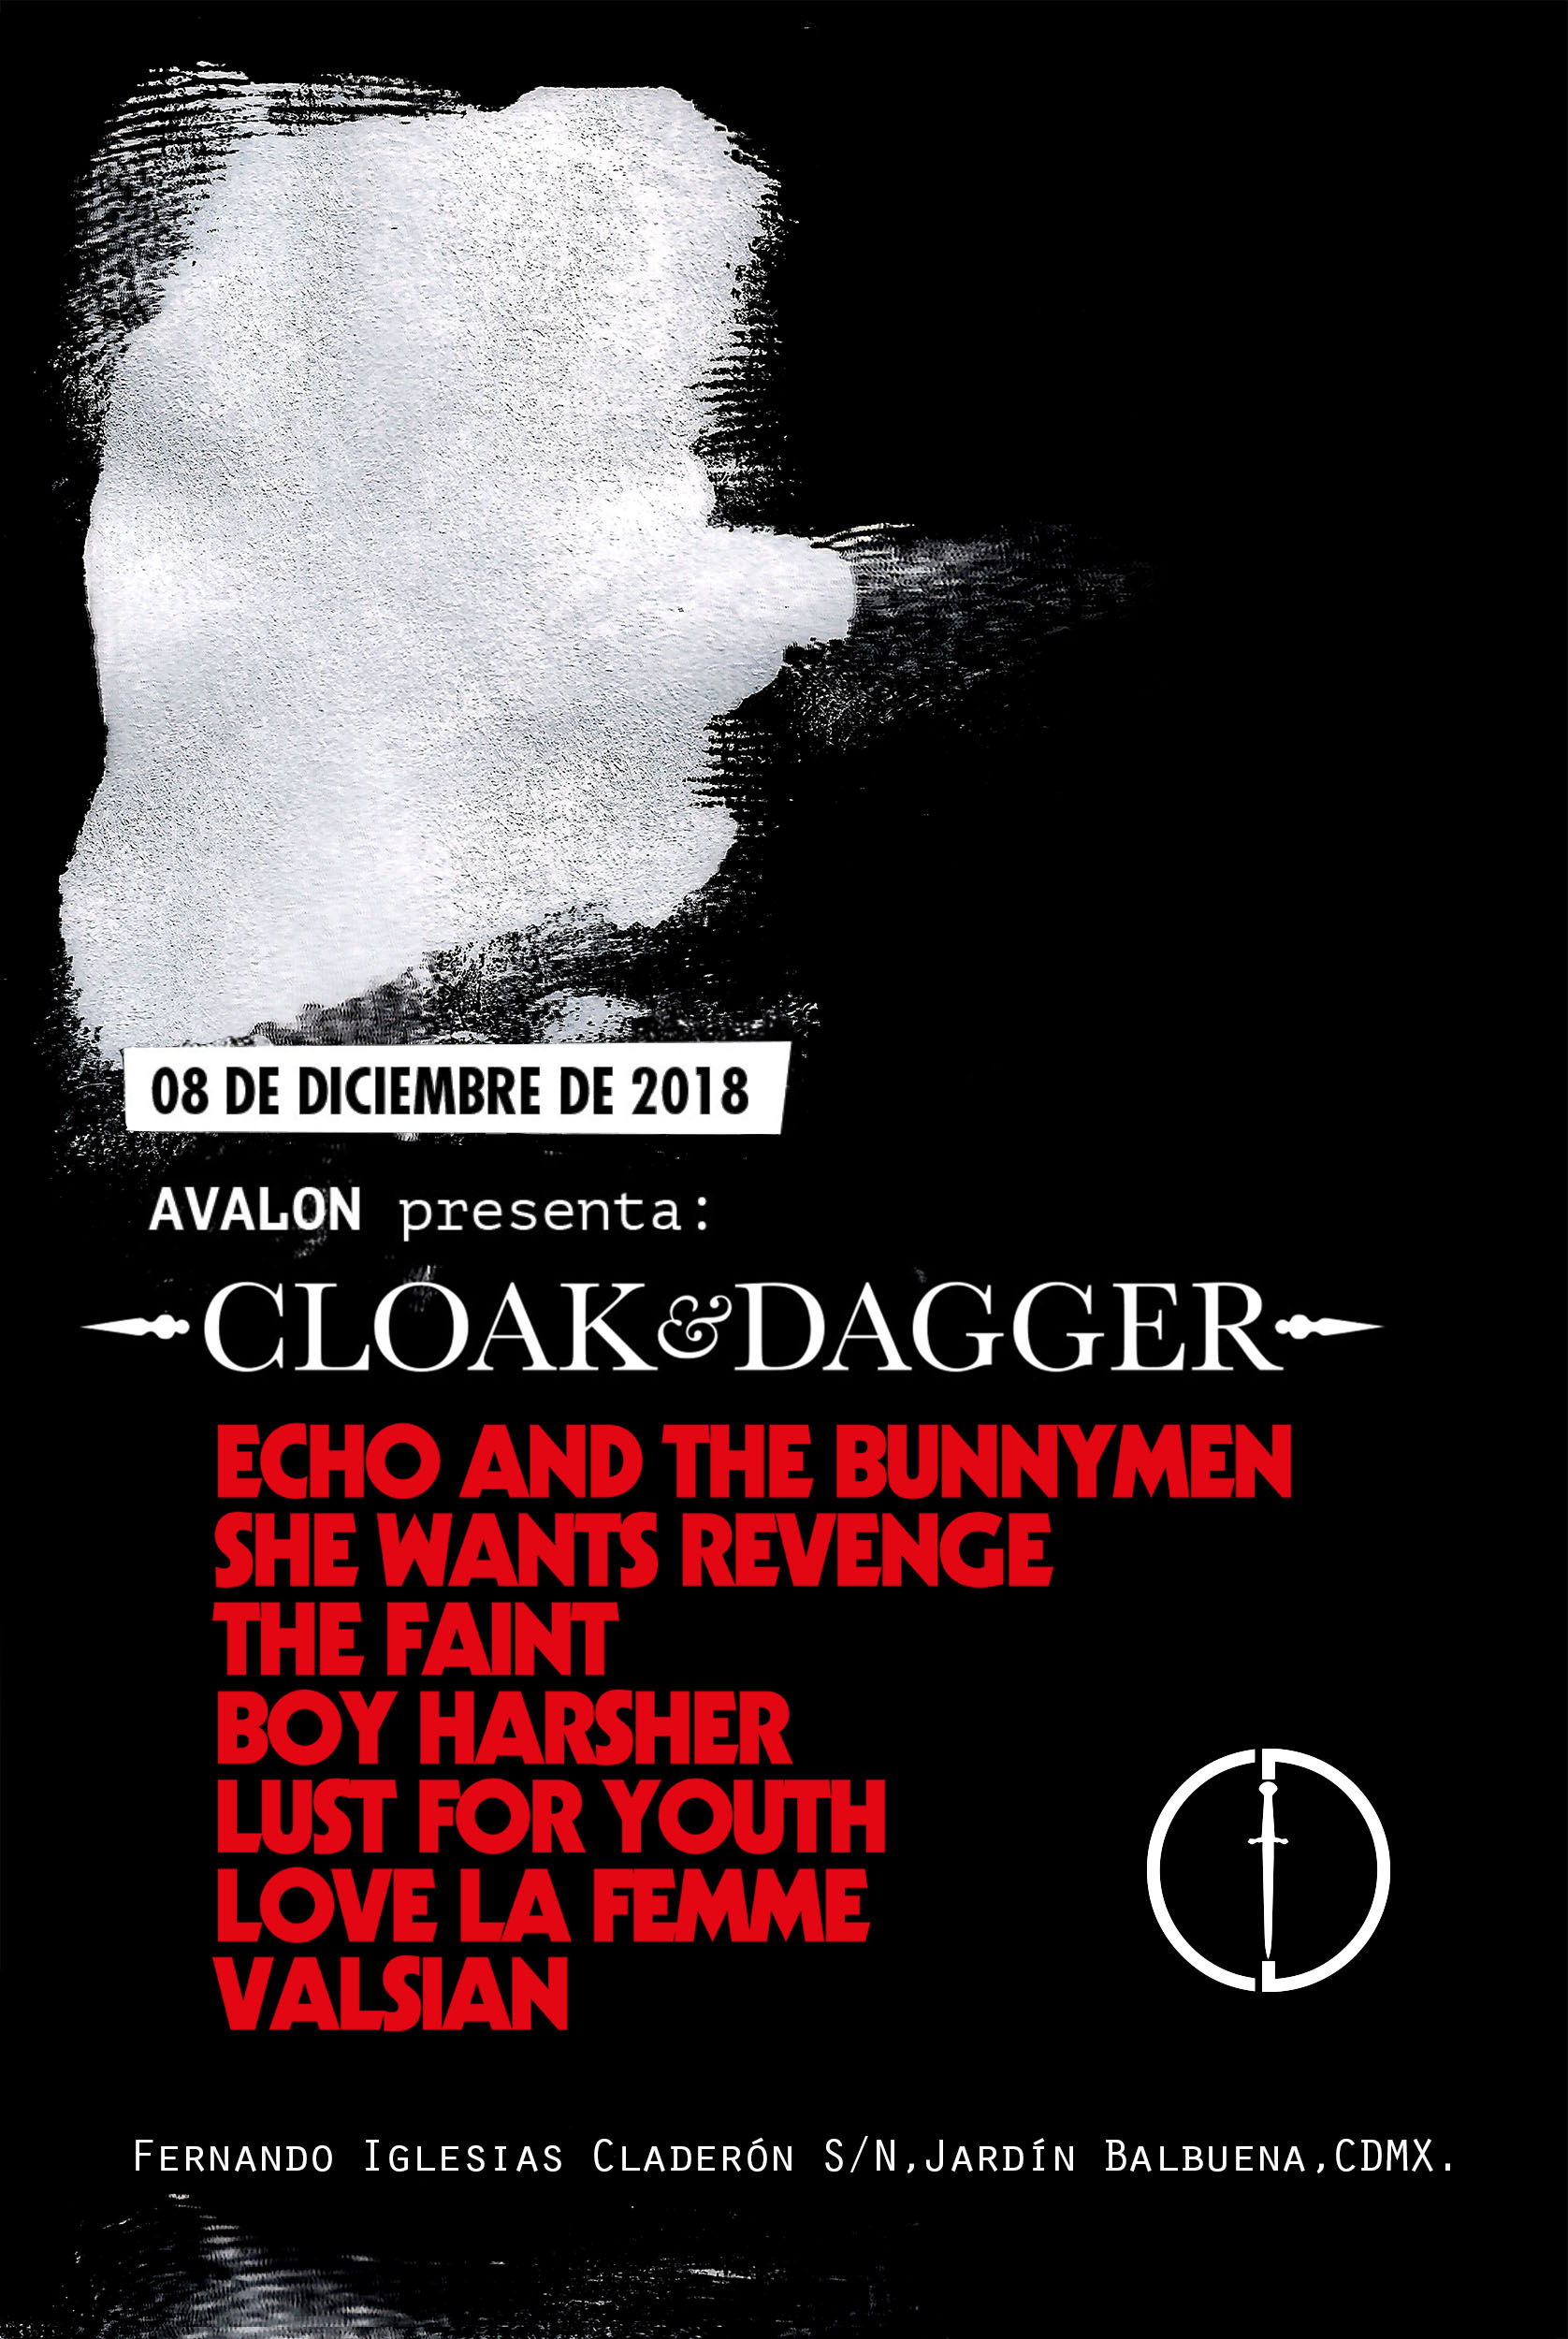 Cloak & Dagger, el nuevo festival que llega a México con Echo And The Bunnymen